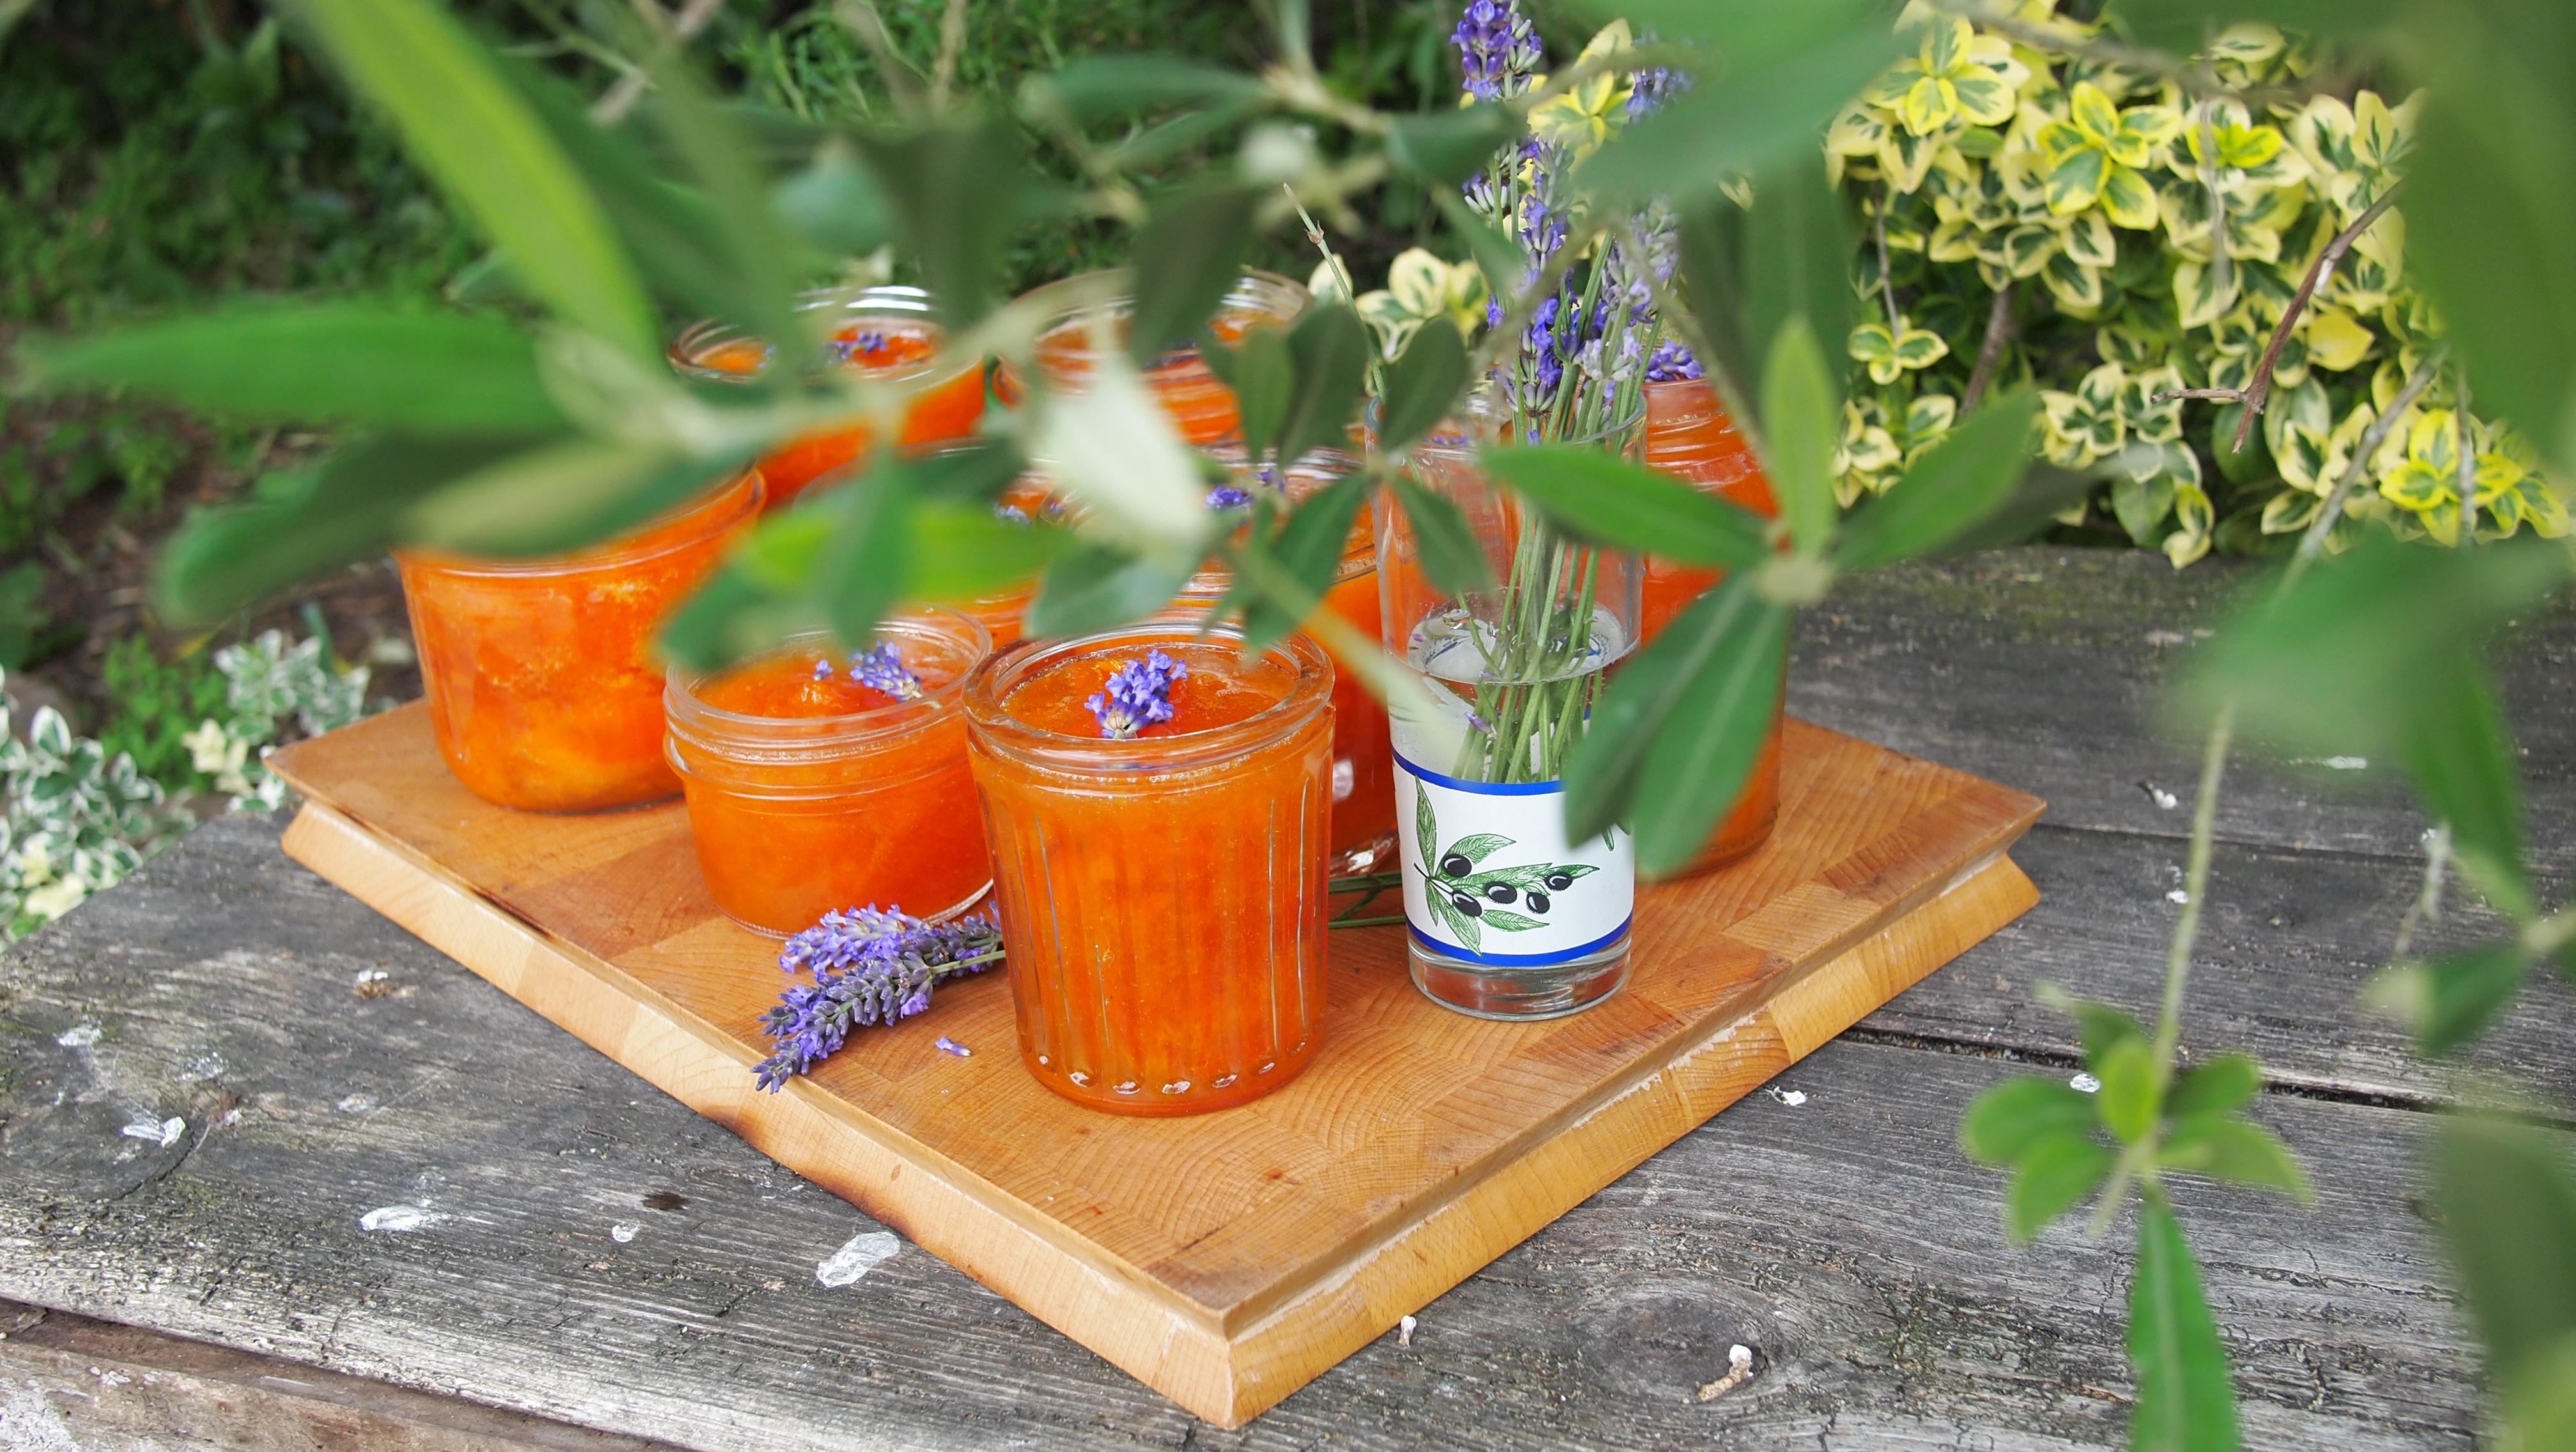 ... Summer Preserve ~ French Set Apricot and Lavender Jam (Confiture